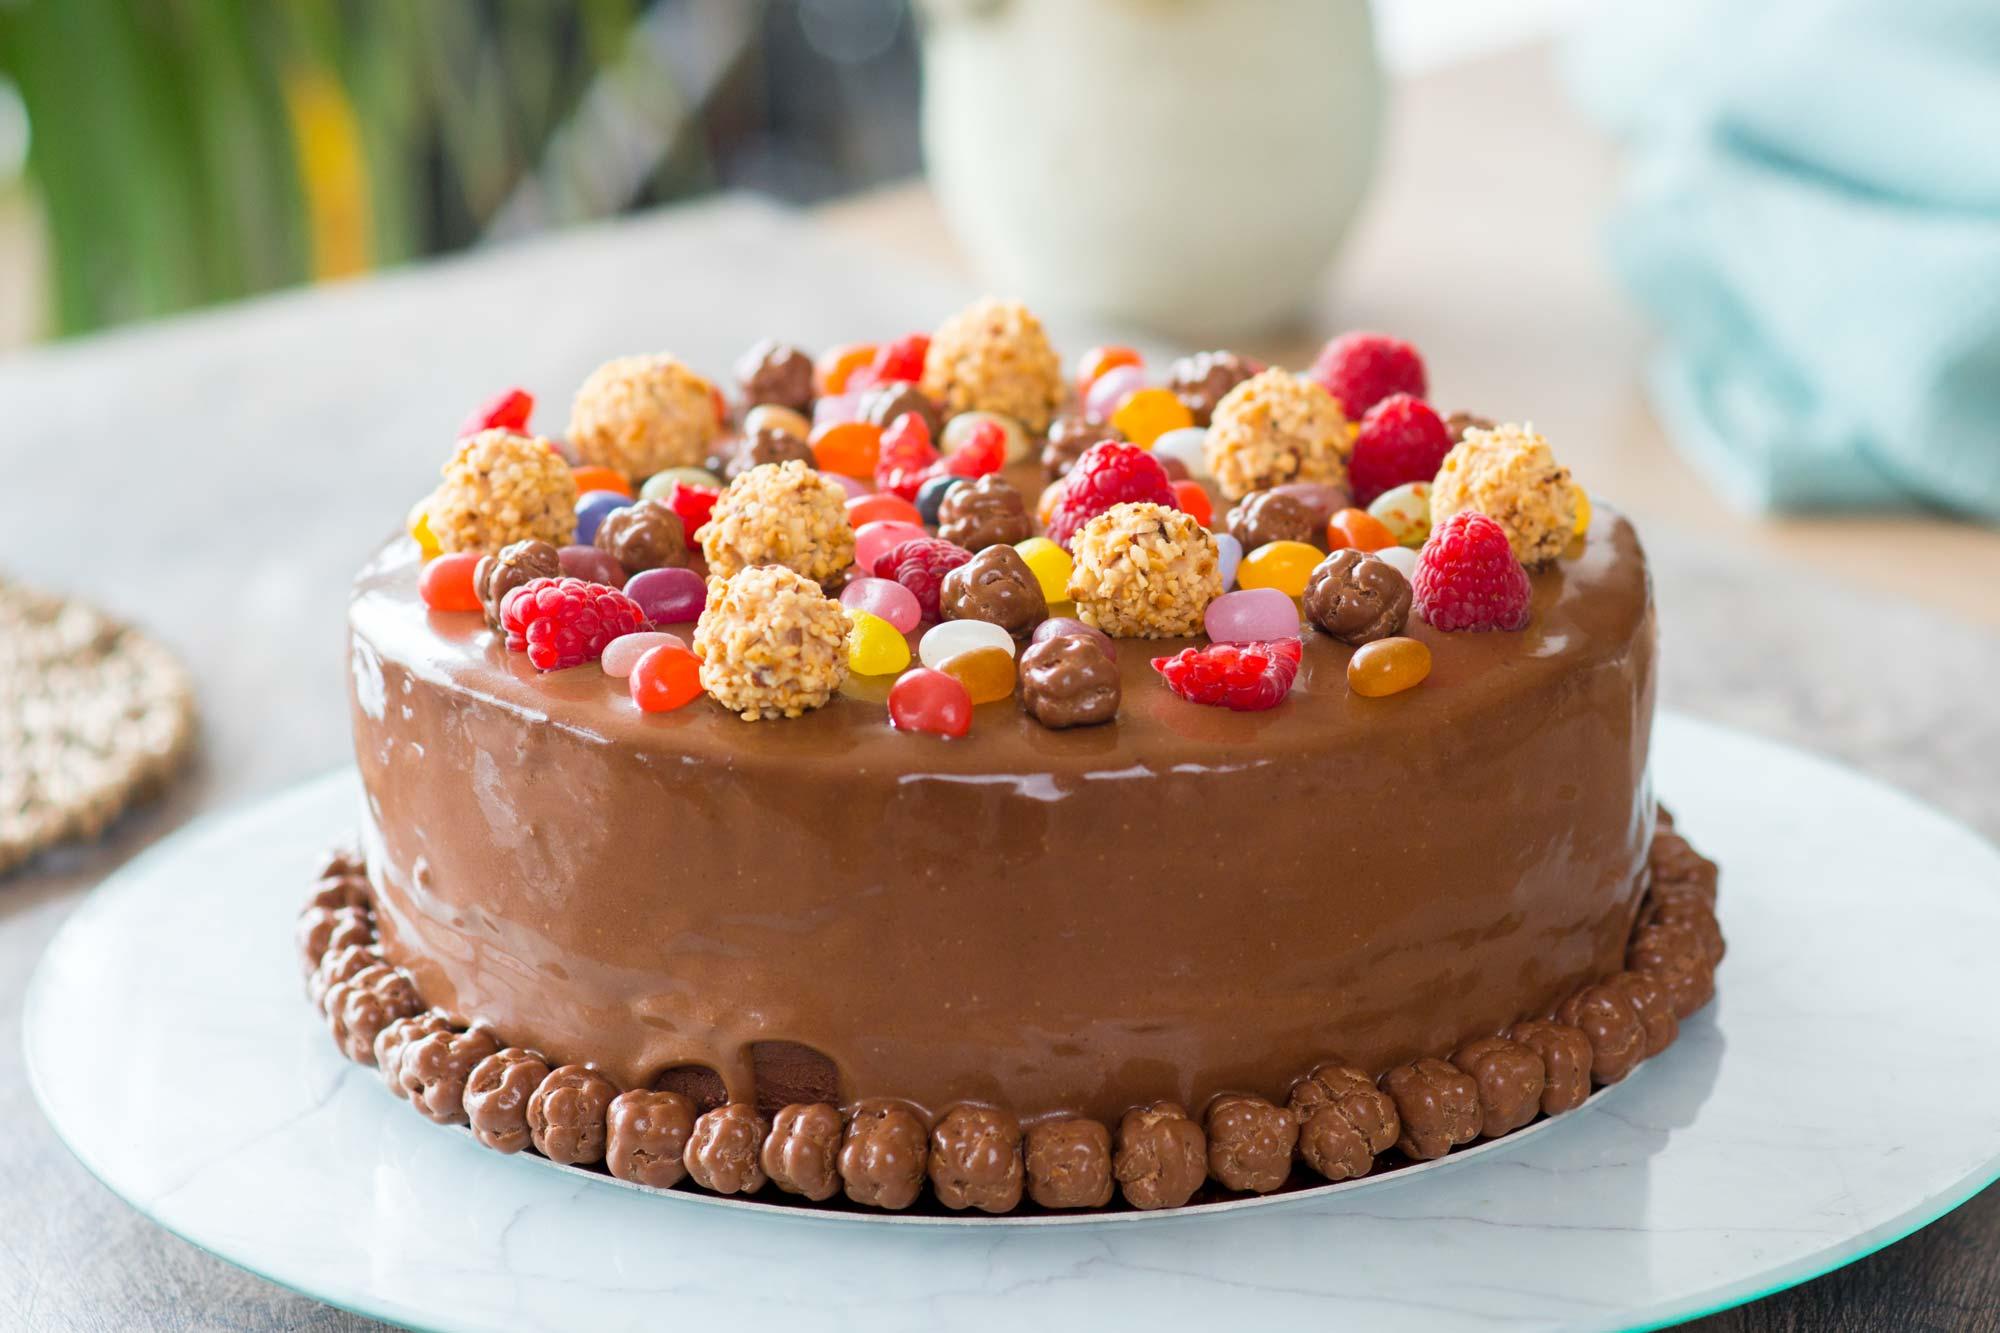 Zelo čokoladna torta z jagodami